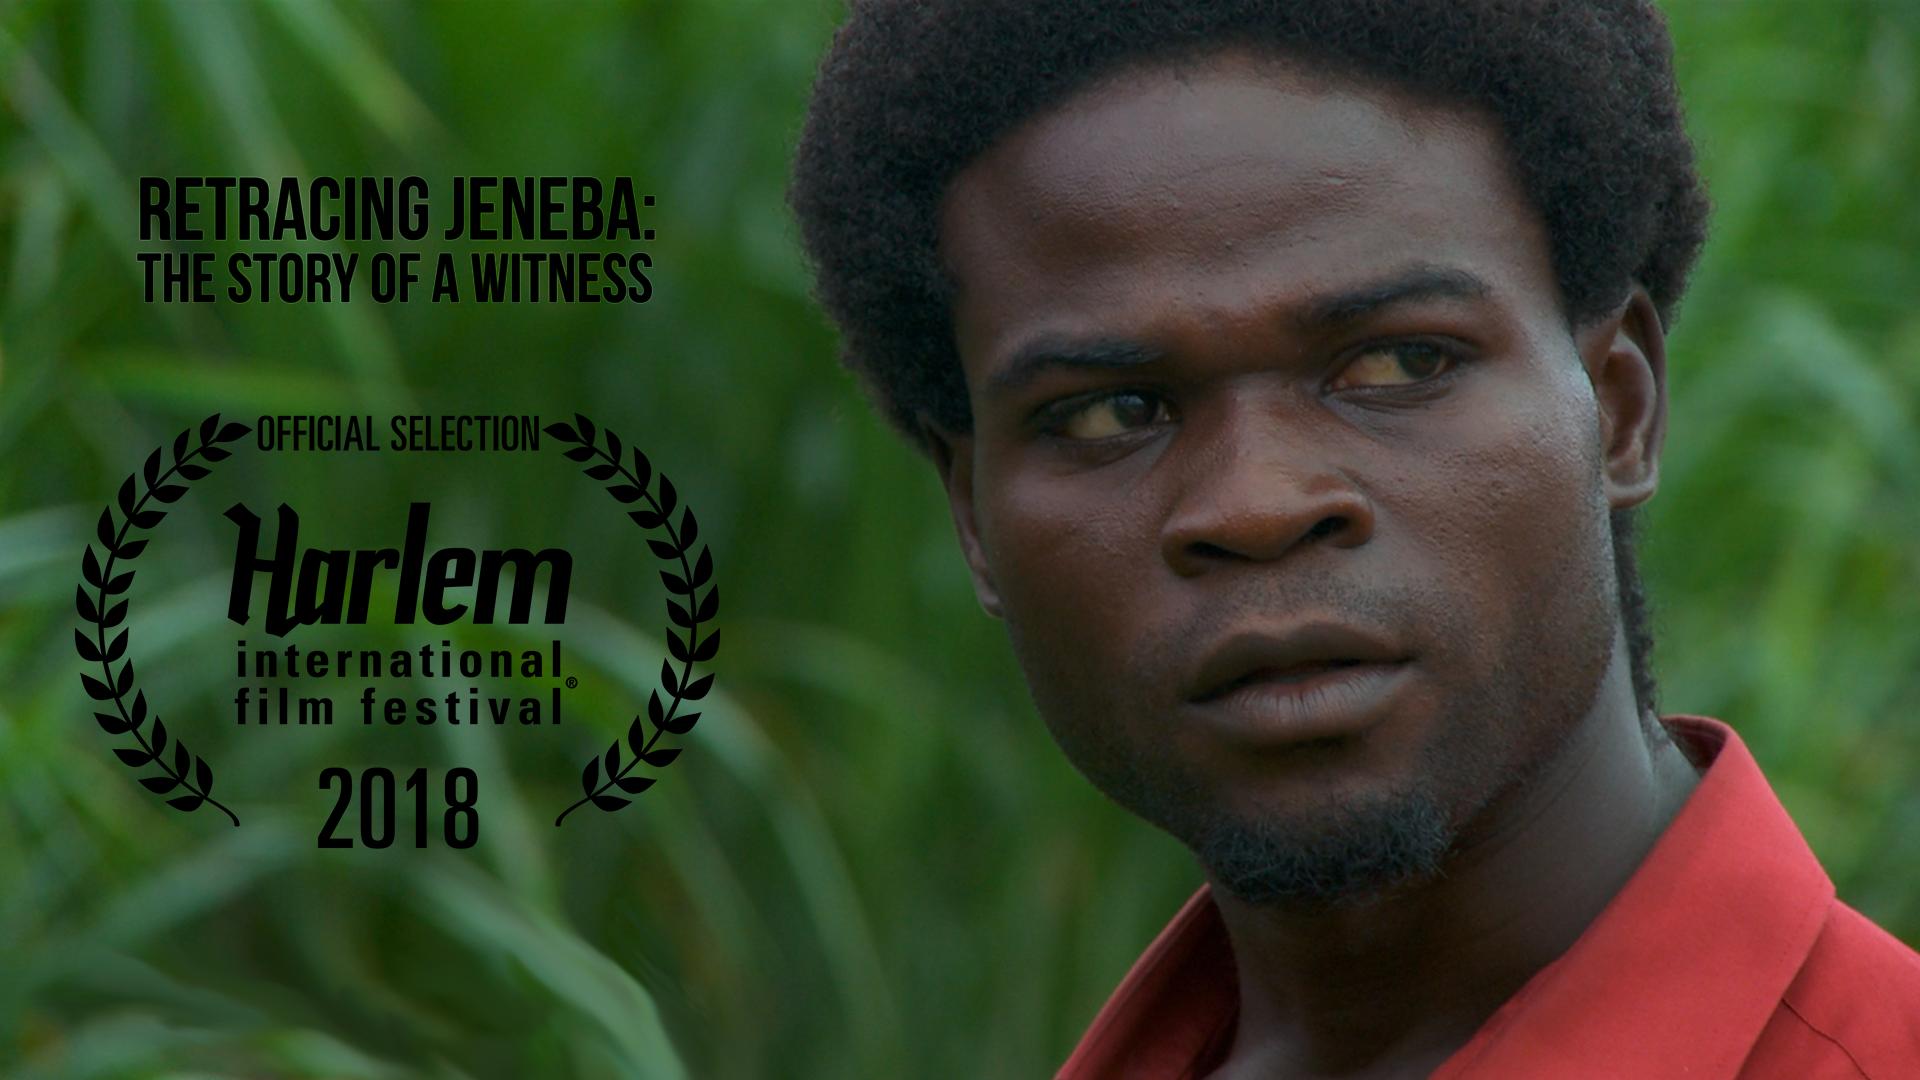 Retracing Jeneba: The Story of a Witness